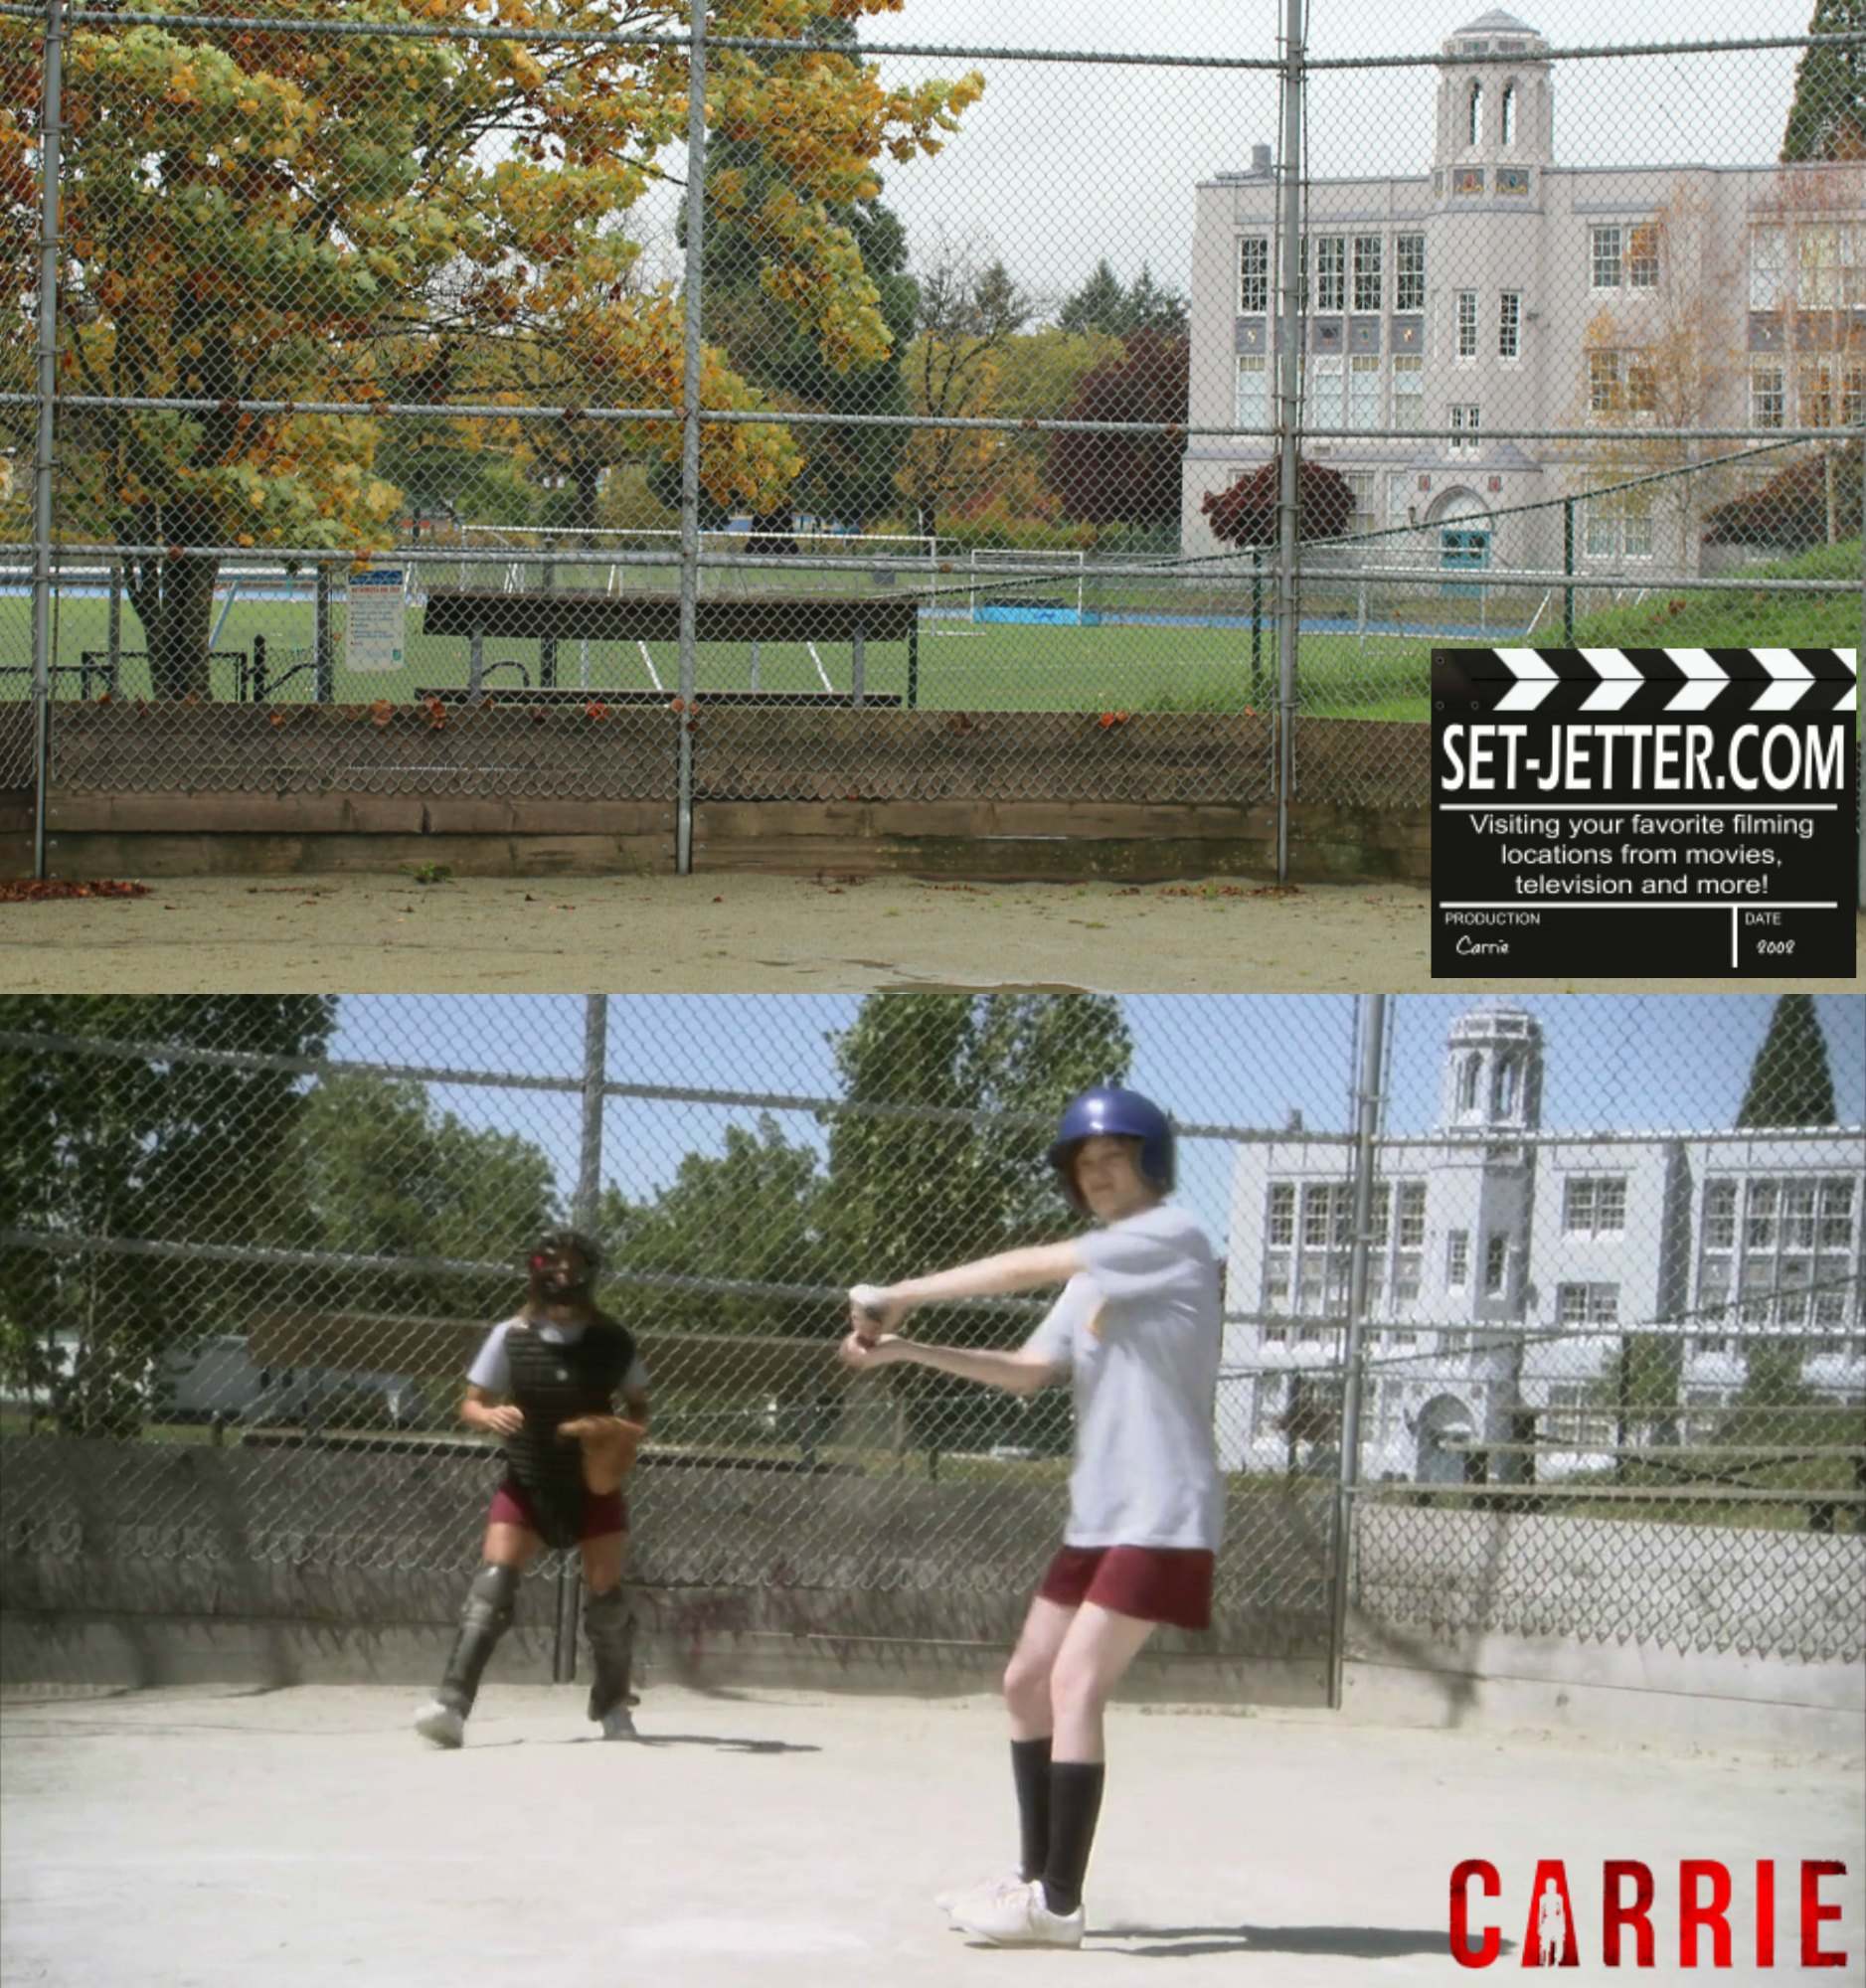 carrie 2002 comparison 05.jpg